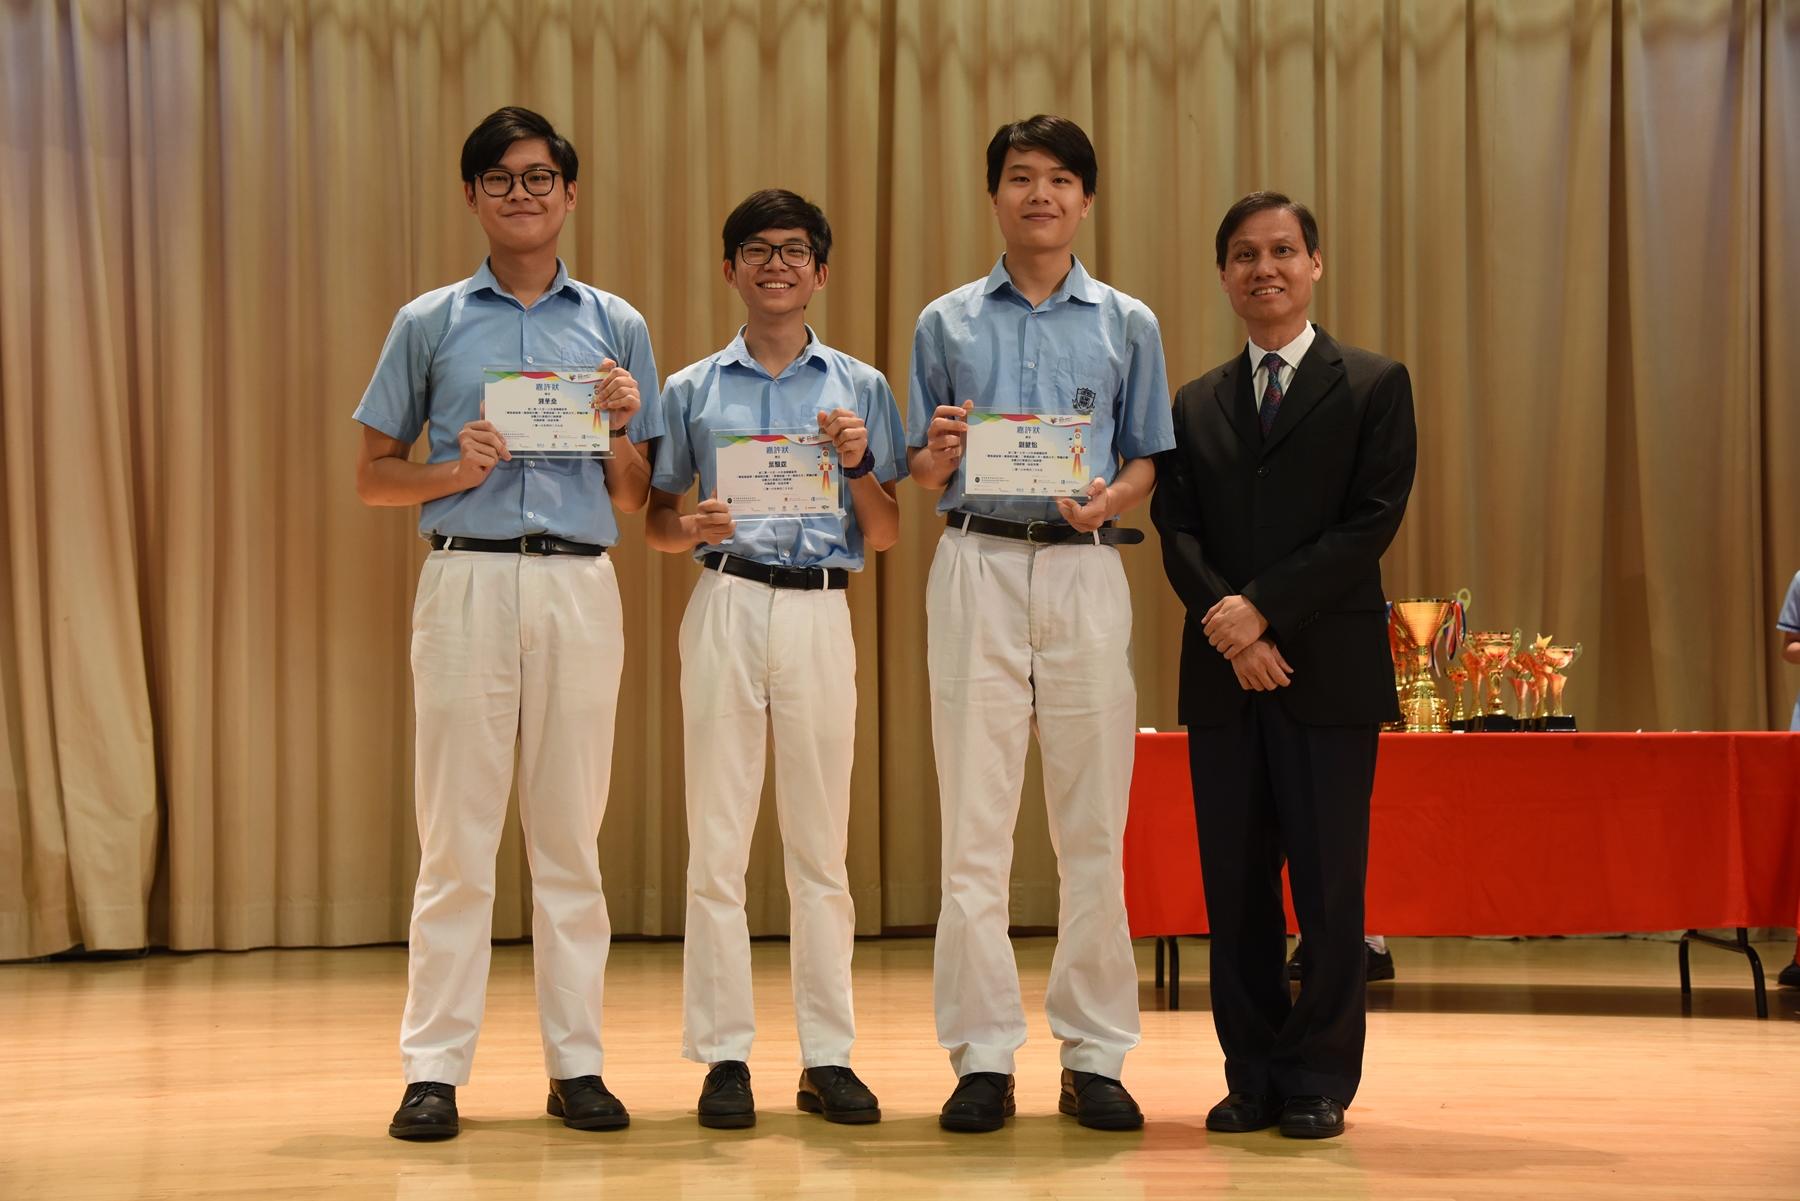 http://npc.edu.hk/sites/default/files/dsc_3805.jpg